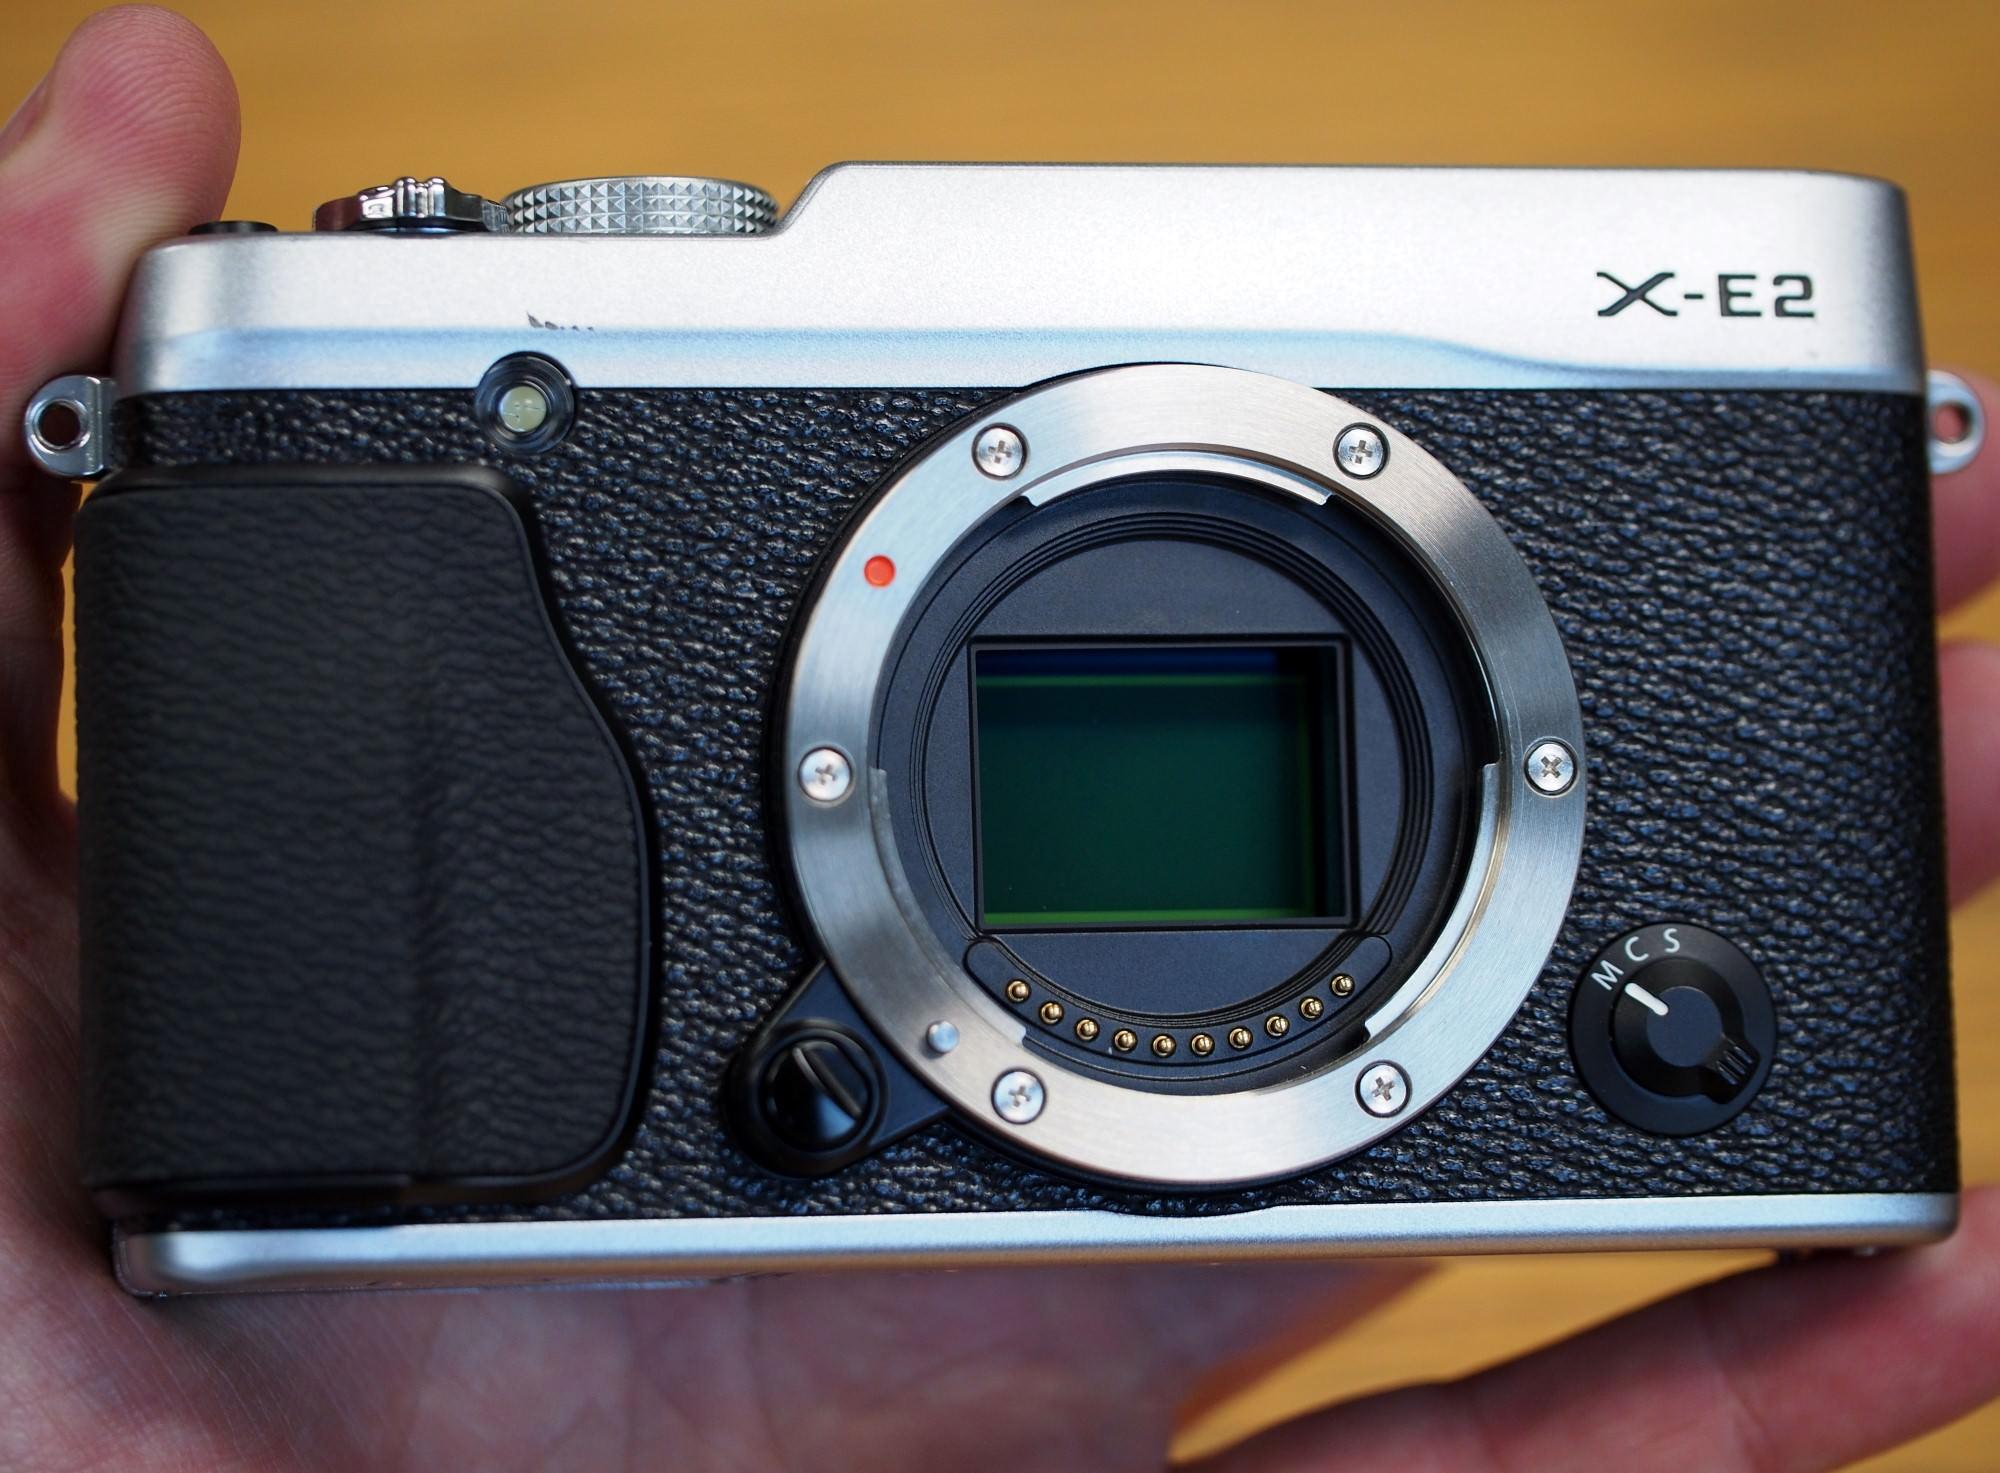 Fujifilm X-E2 Hands-On Preview | ePHOTOzine